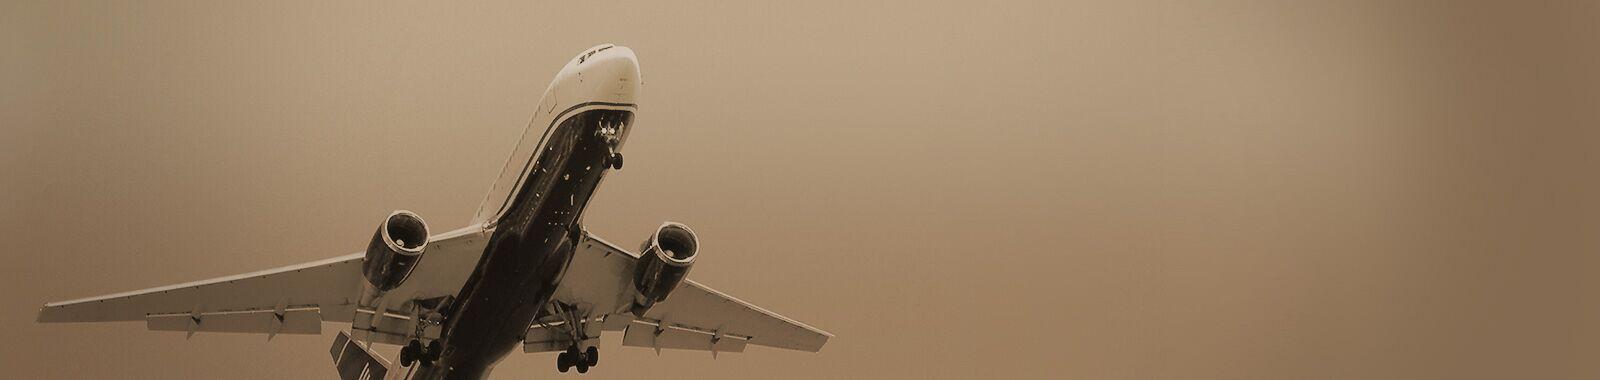 section-bg-home-plane-02